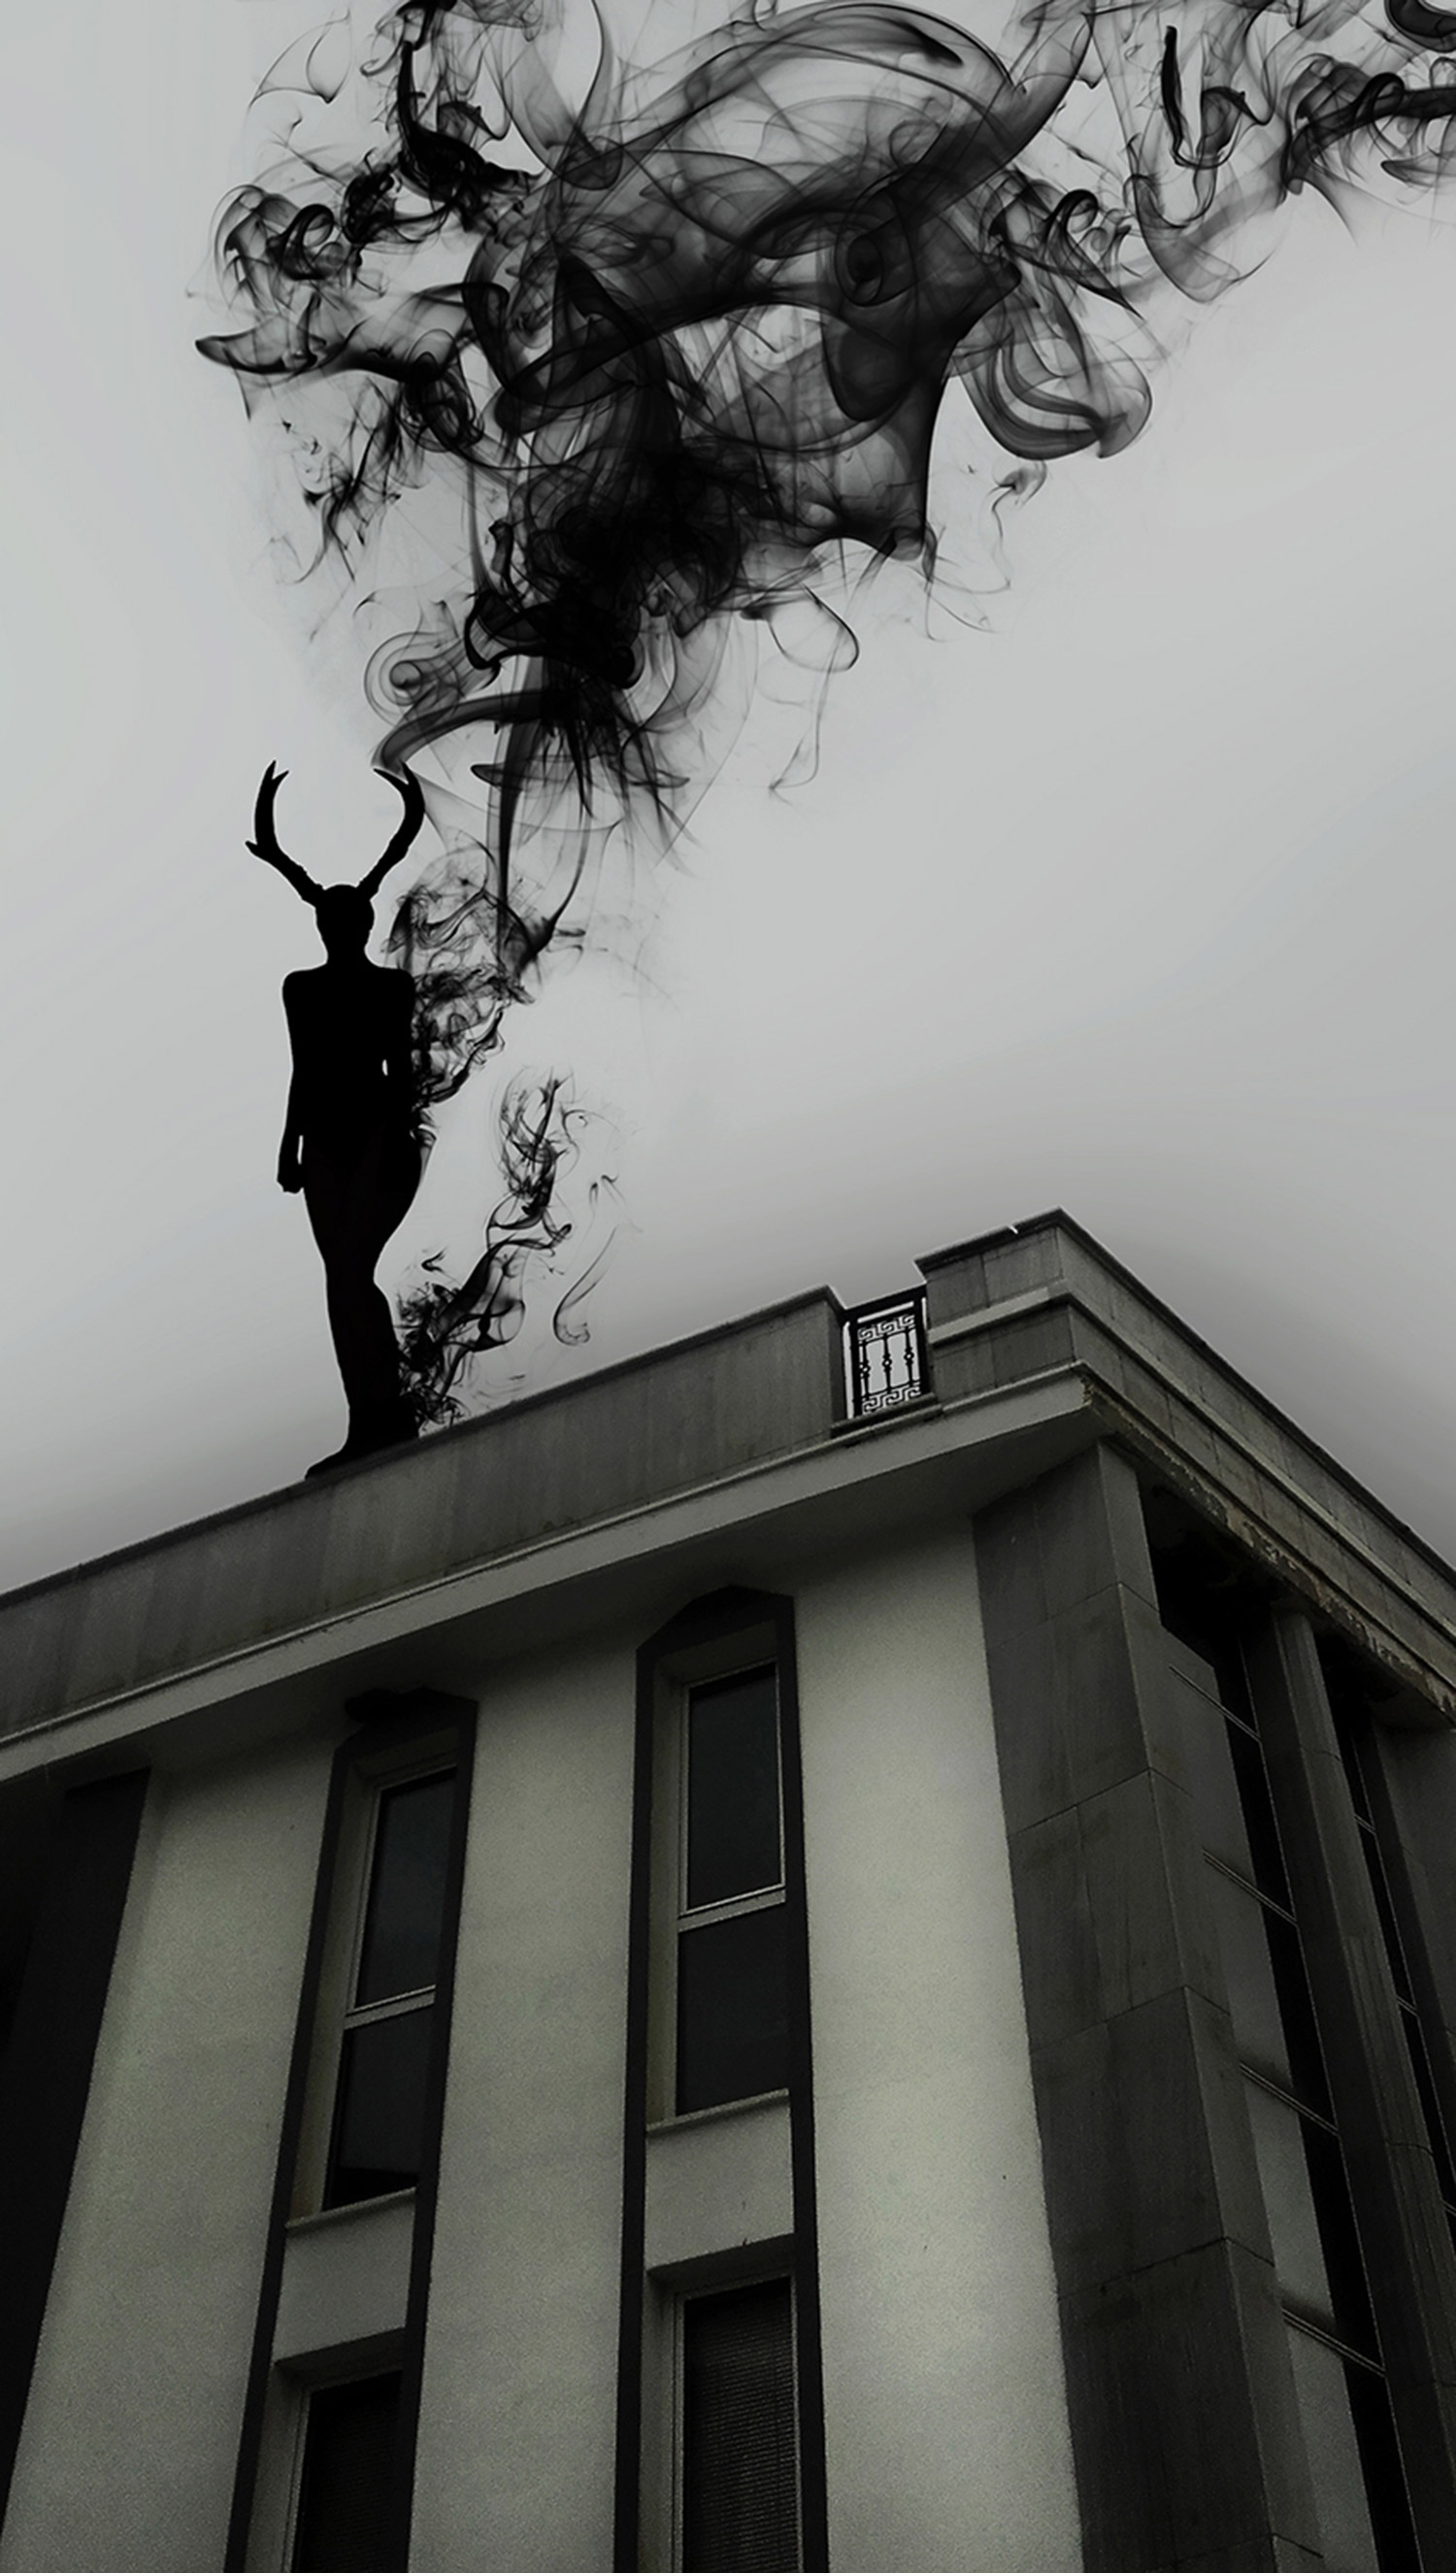 Valeria Chorozidi - ominous dark figure on building